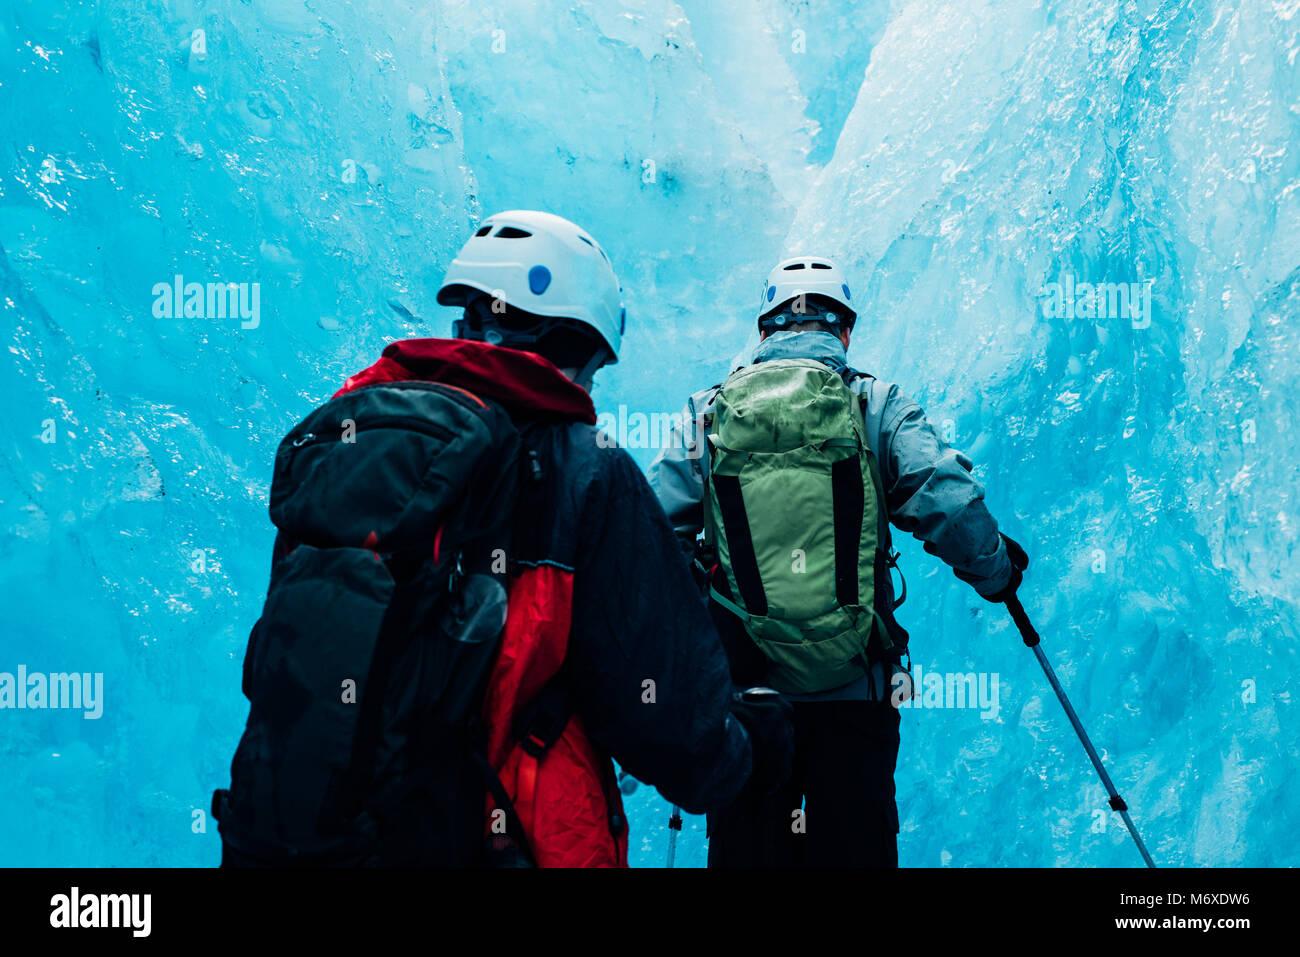 Ice Climbing at Exit Glacier - Stock Image